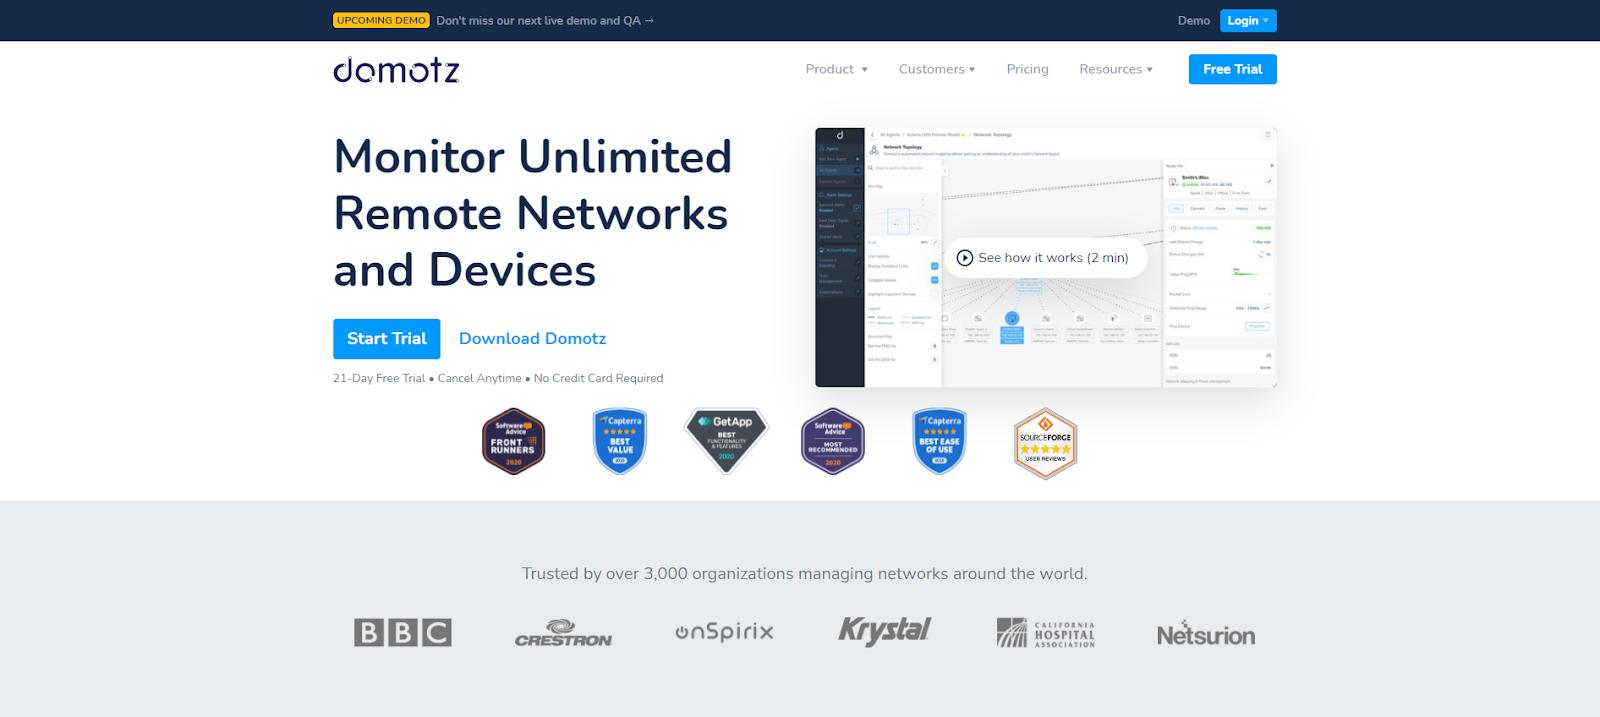 Domotz Pro Network Monitoring Tool